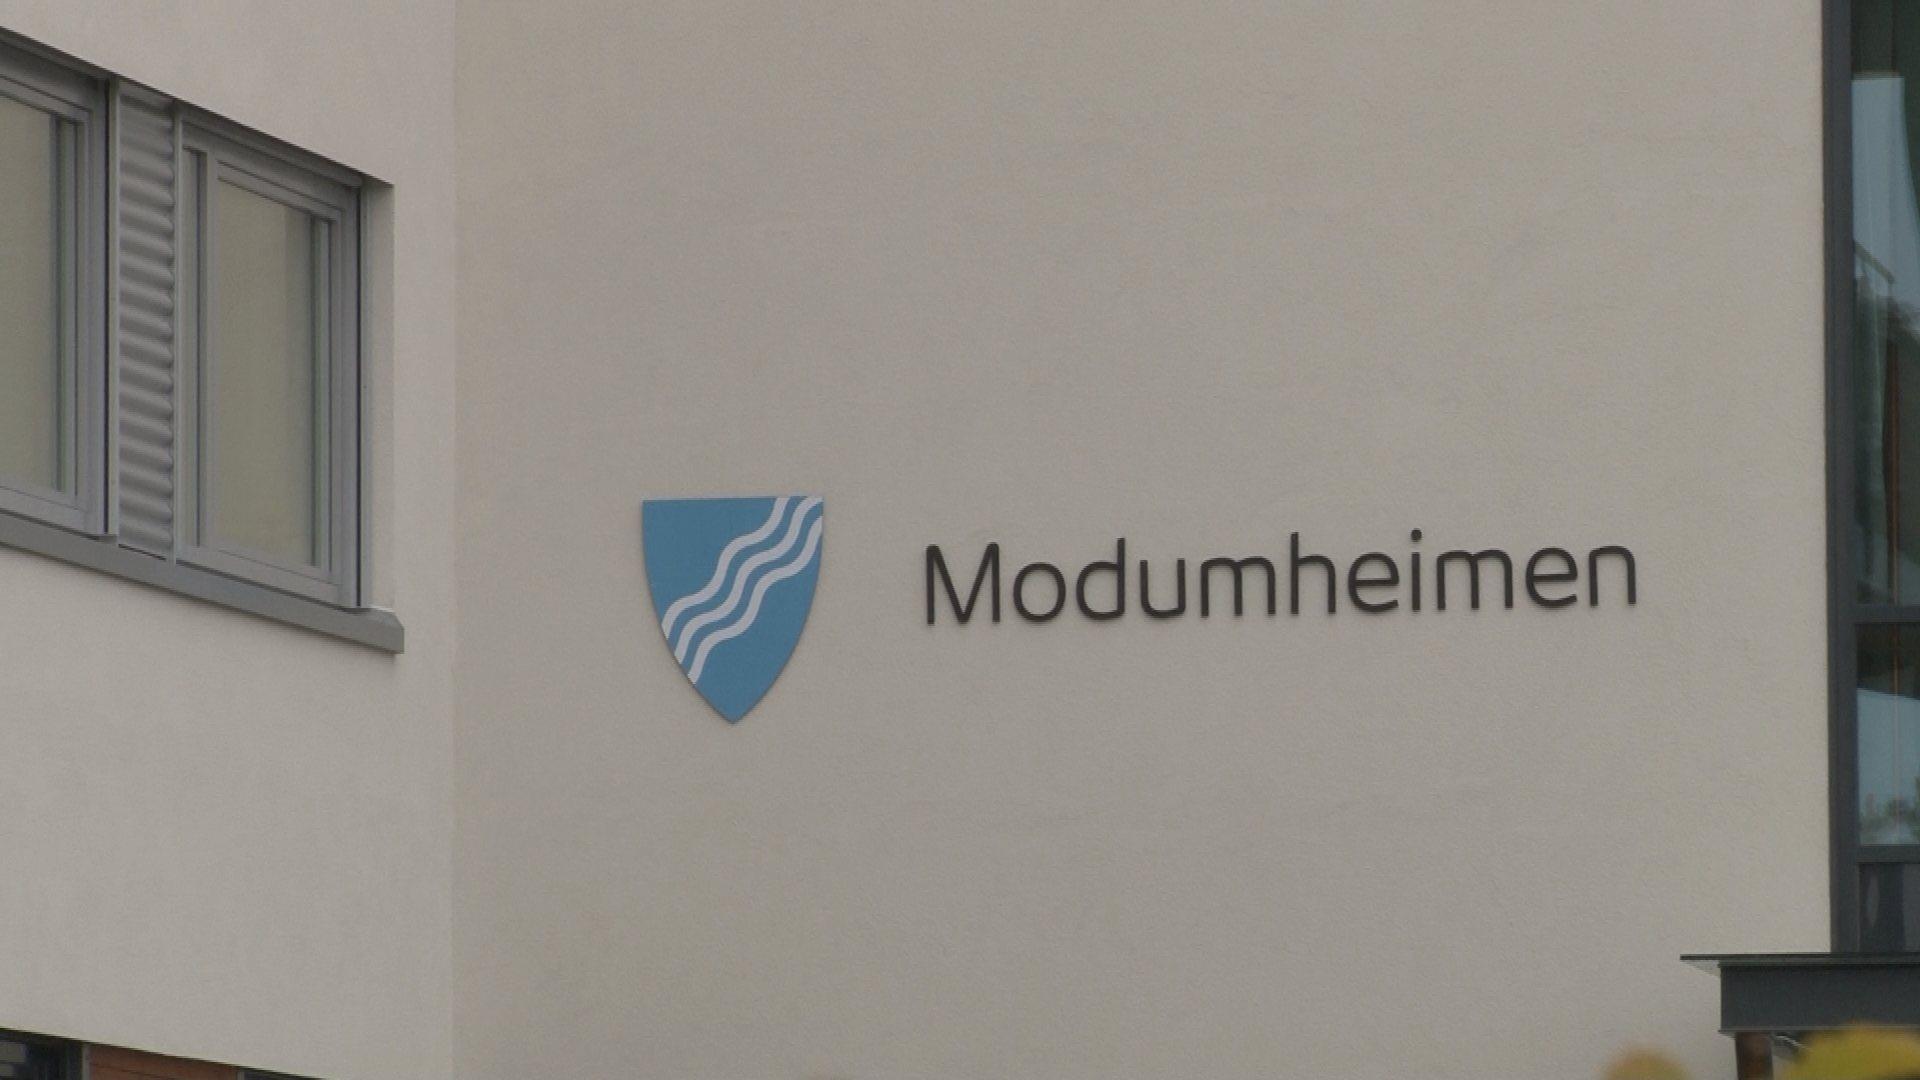 2Coronadødsfall på Modumheimen